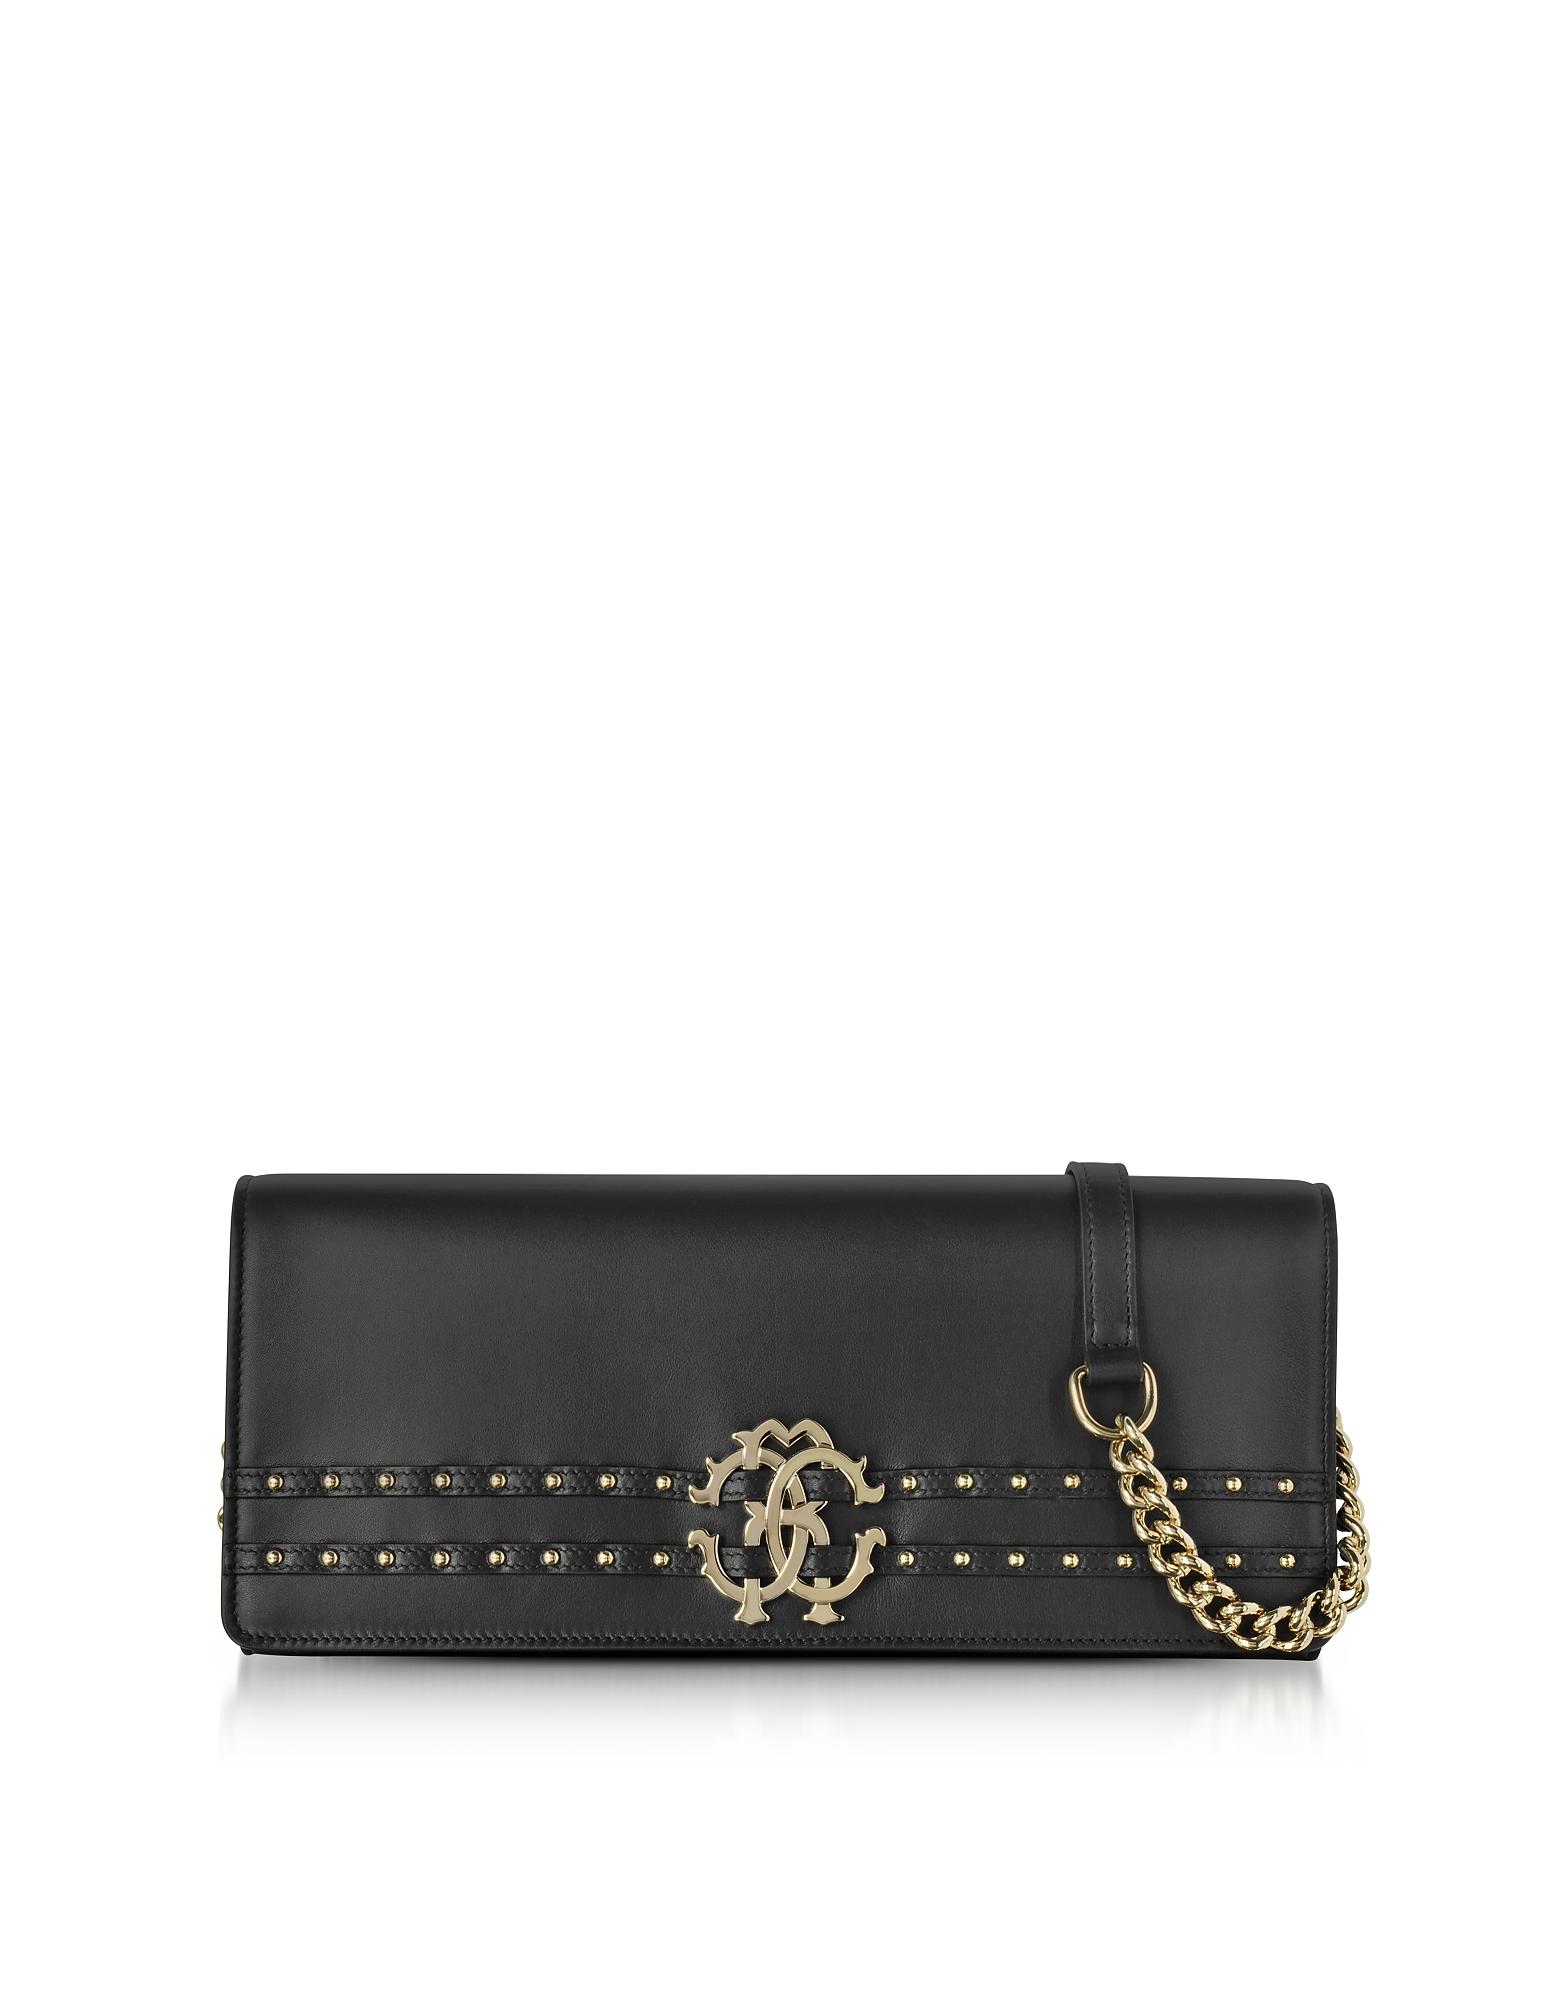 Roberto Cavalli Handbags, Black Leather Clutch w/Chain Shoulder Strap and Studs